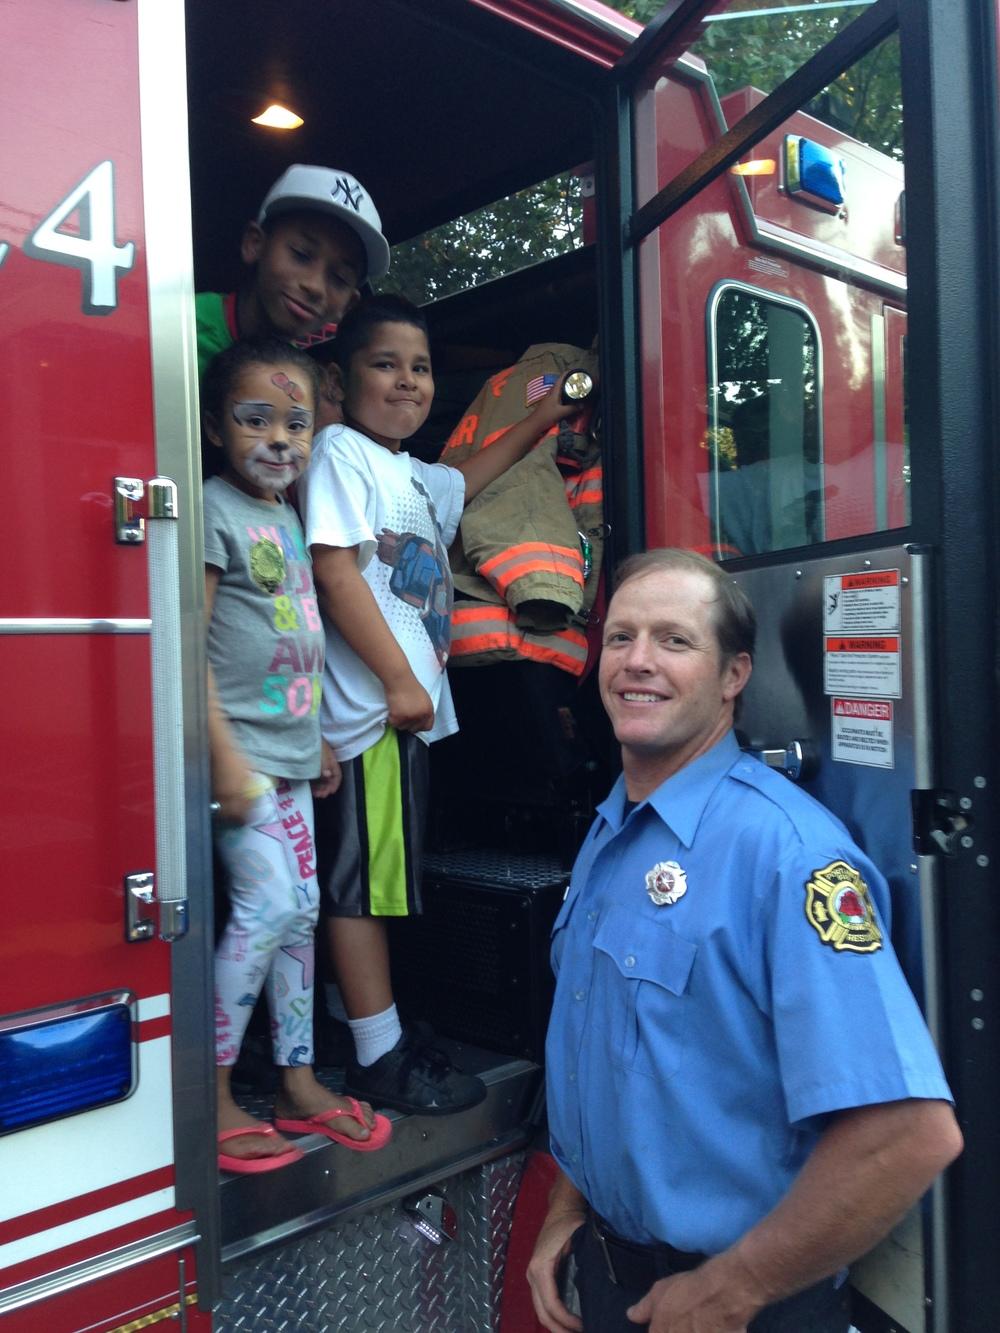 Firemen let kids play in their firetrucks